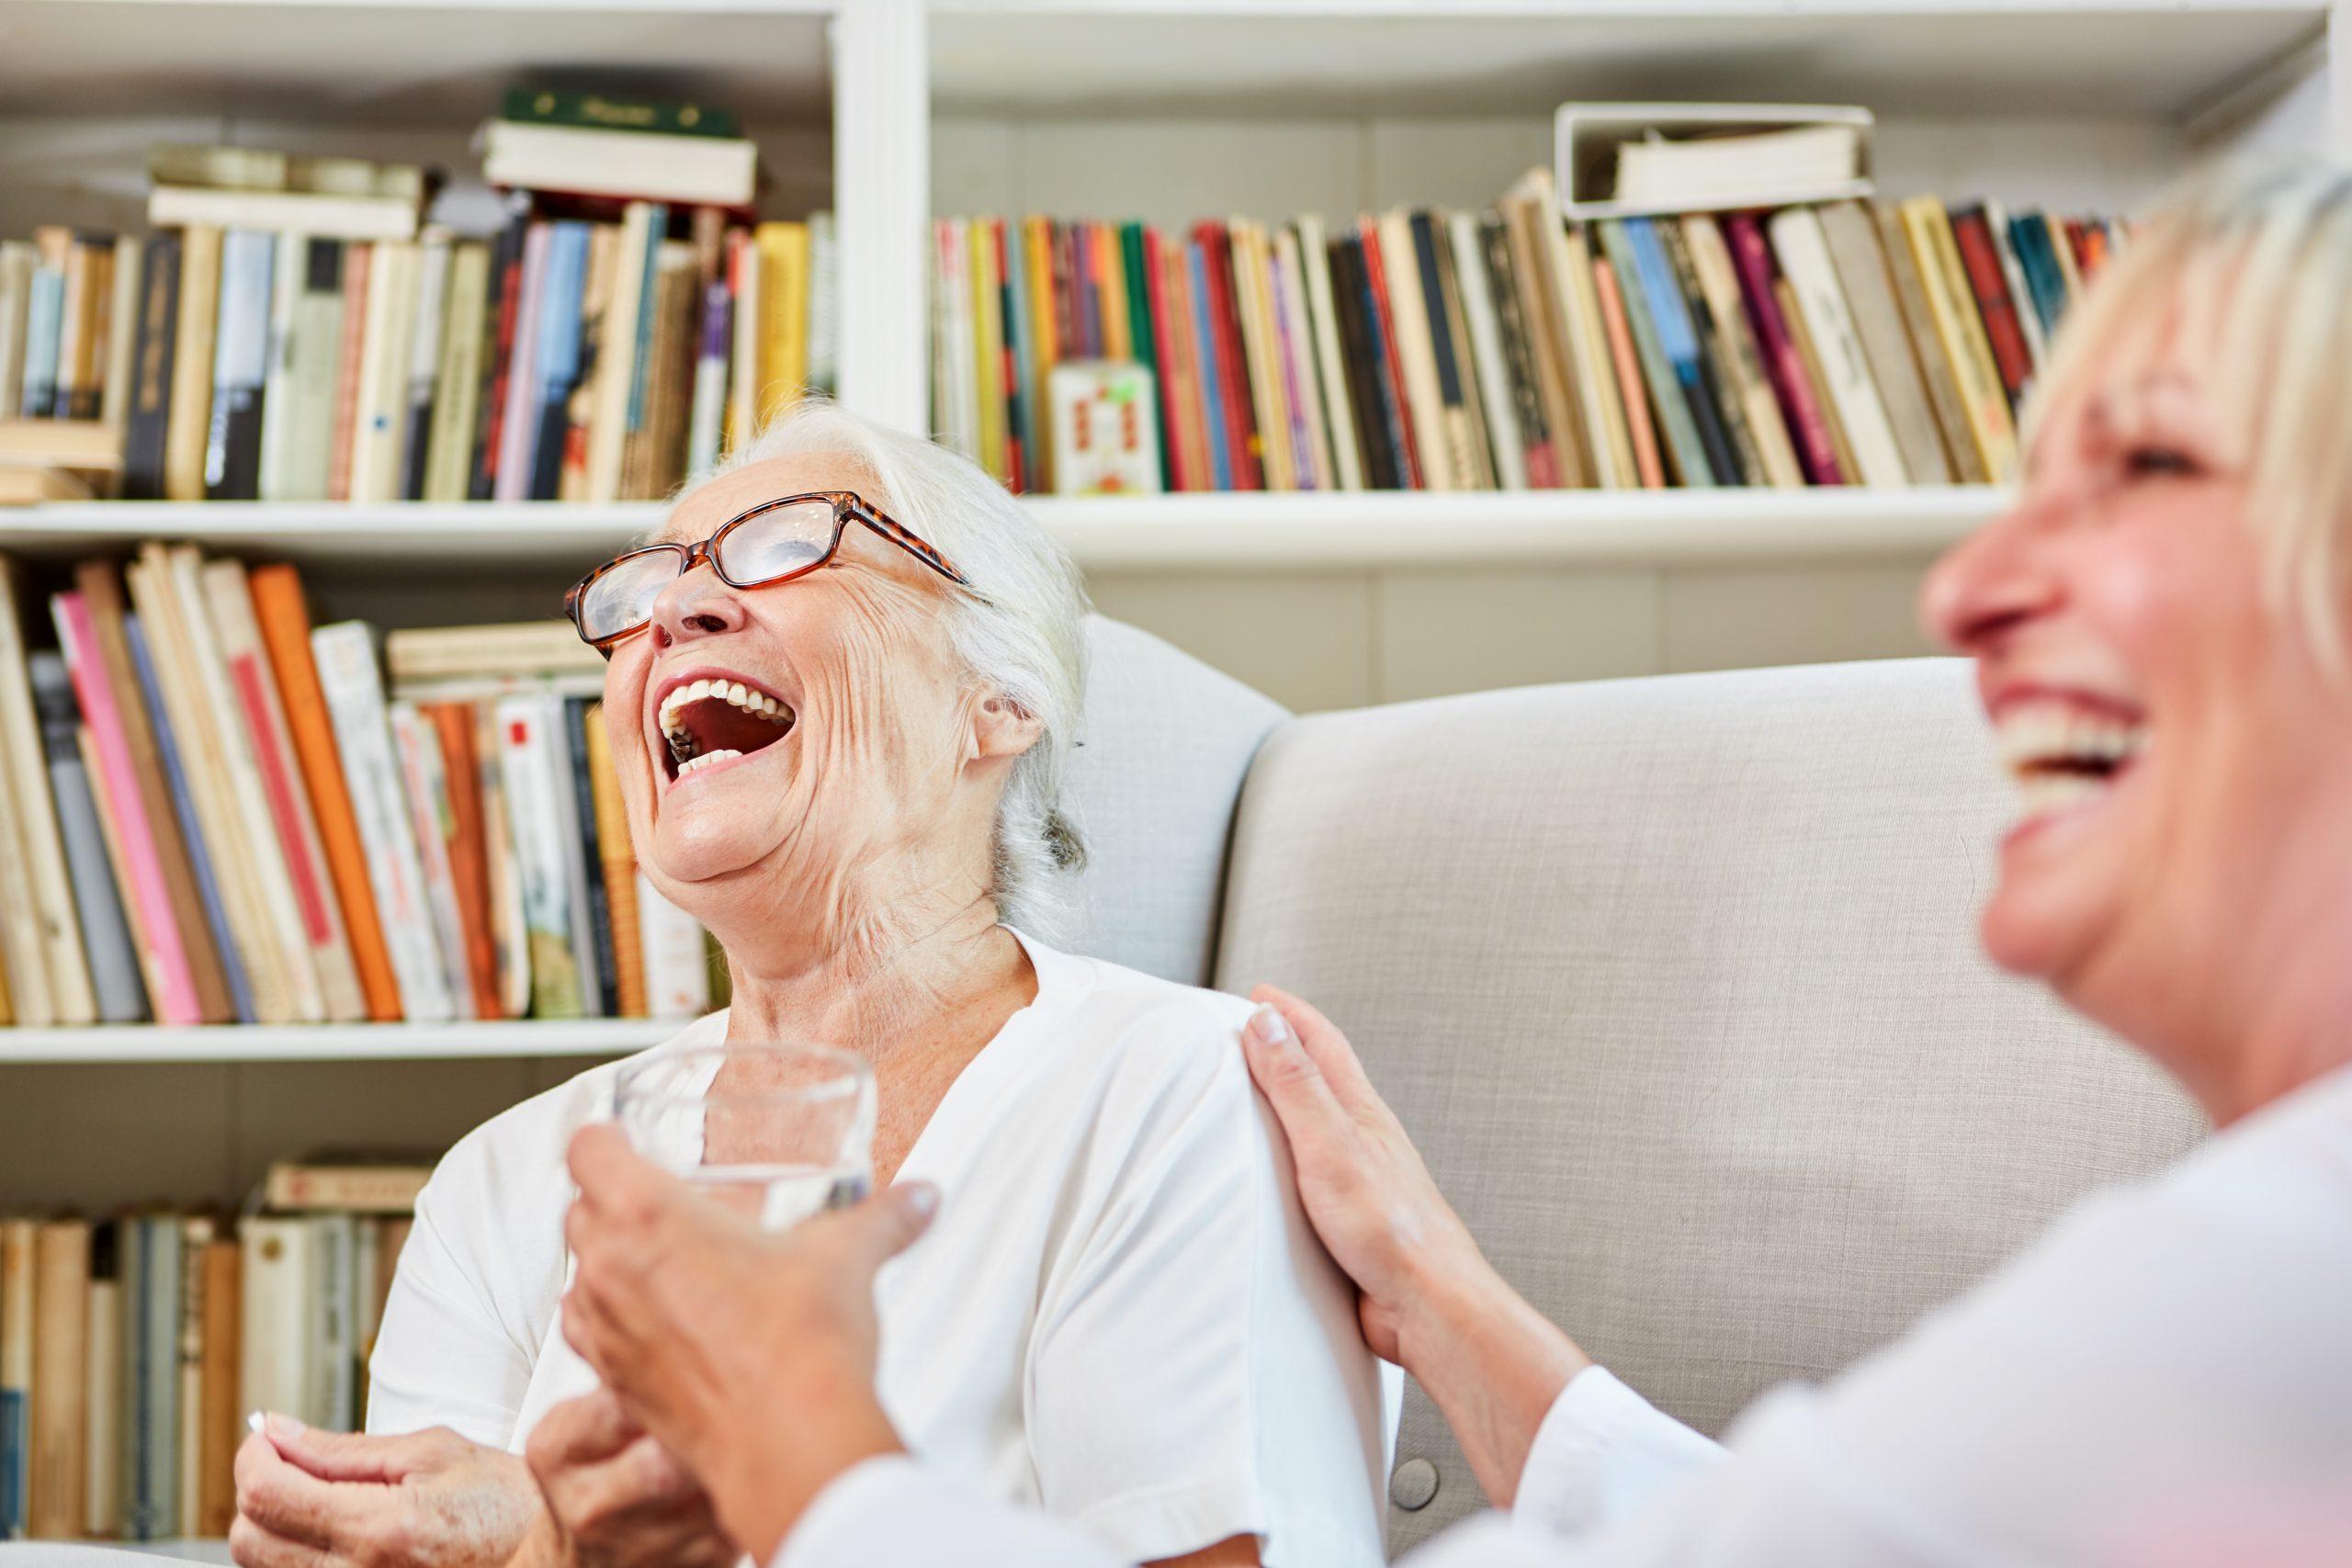 companionship-care-senior-enjoying-moment-with-senior-care-plus-cargiver